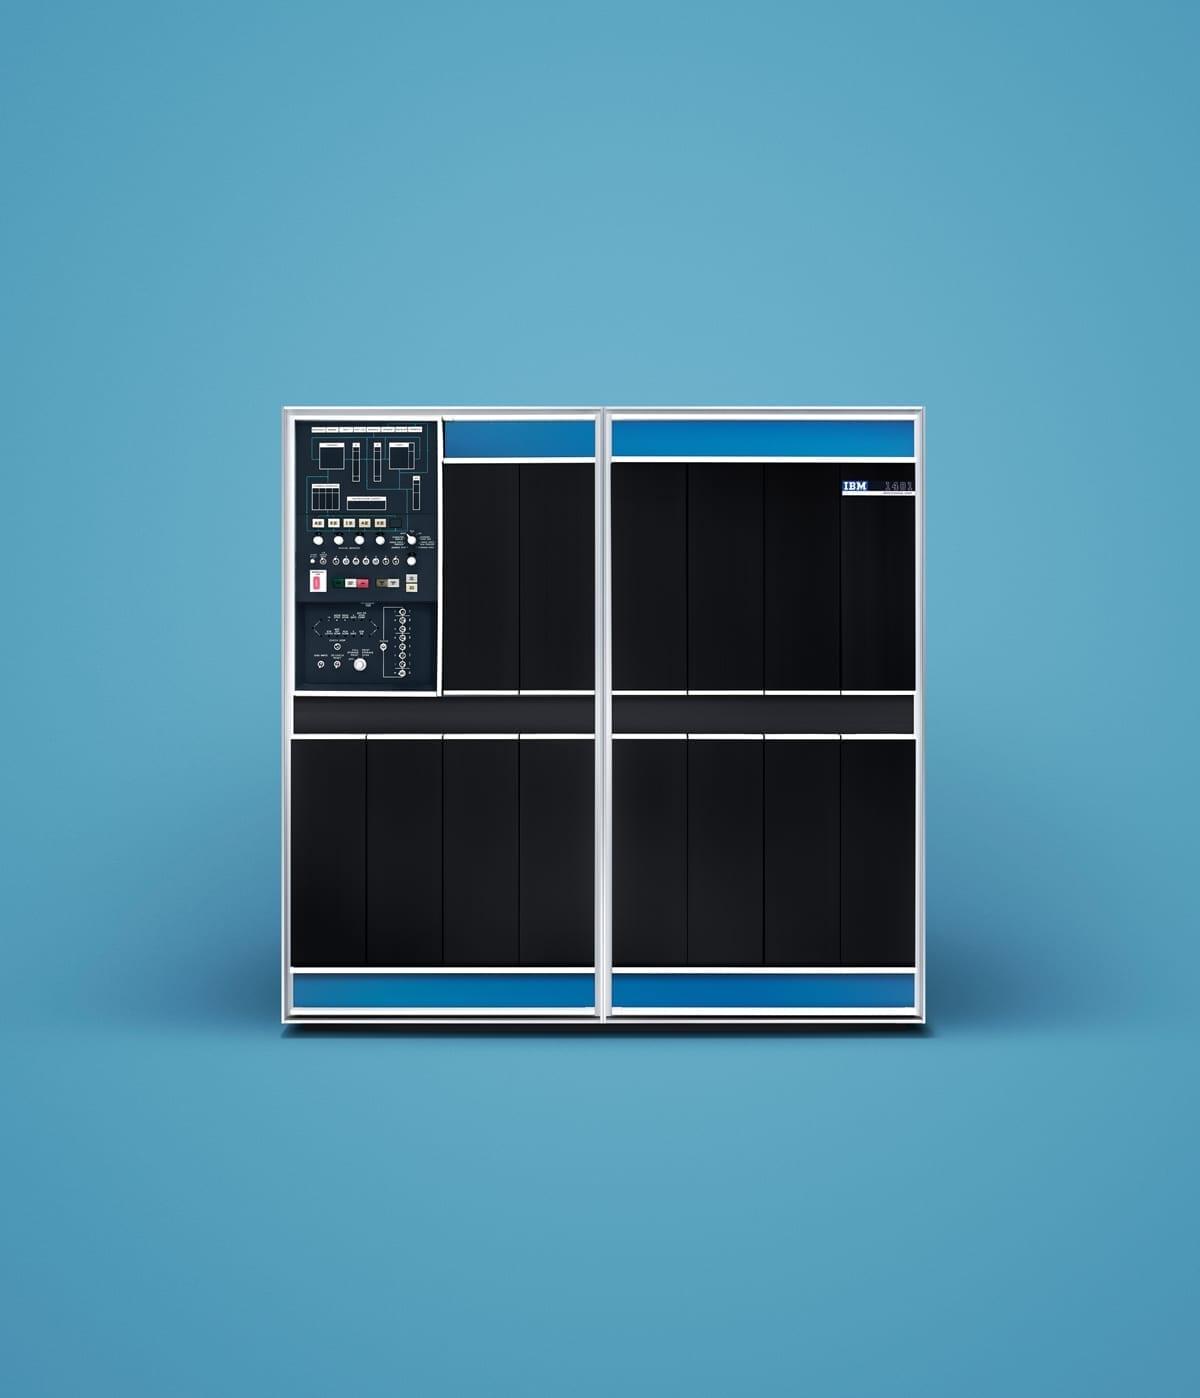 retro-computers